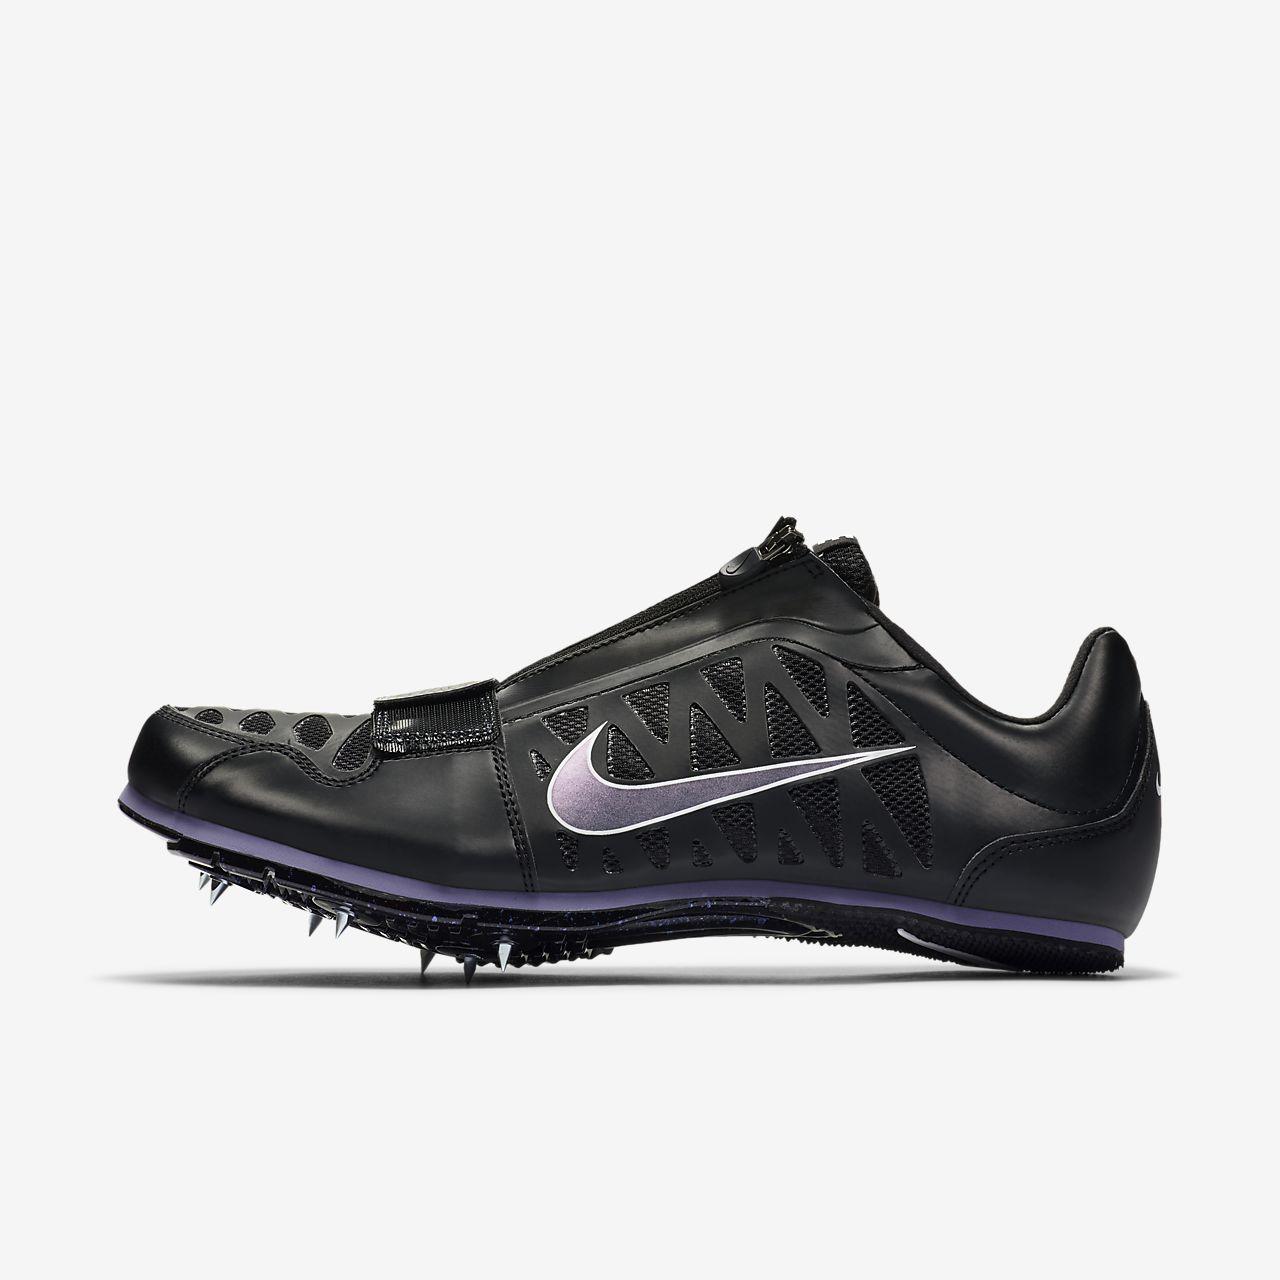 Kolce do skoków uniseks Nike Zoom LJ 4